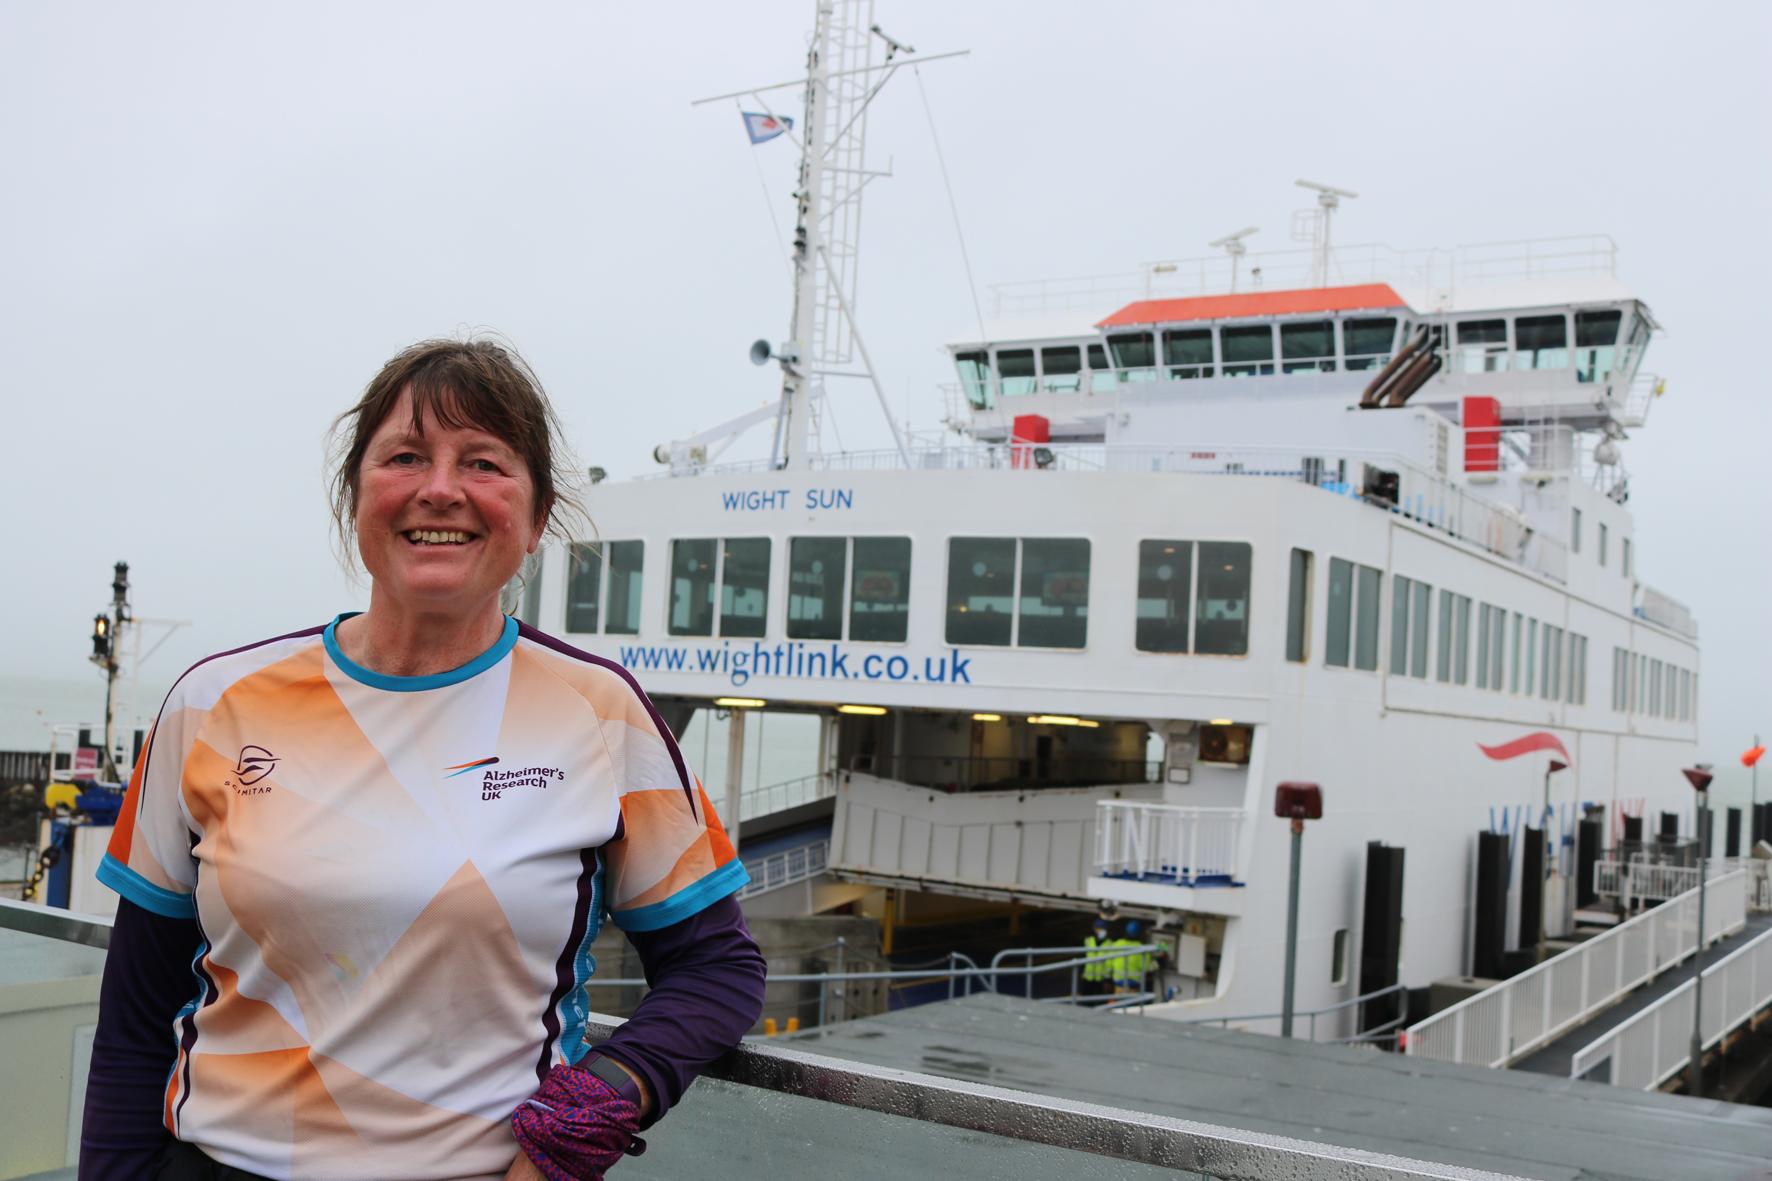 Walker Karen Penny in front of a Wightlink ferry inYarmouth